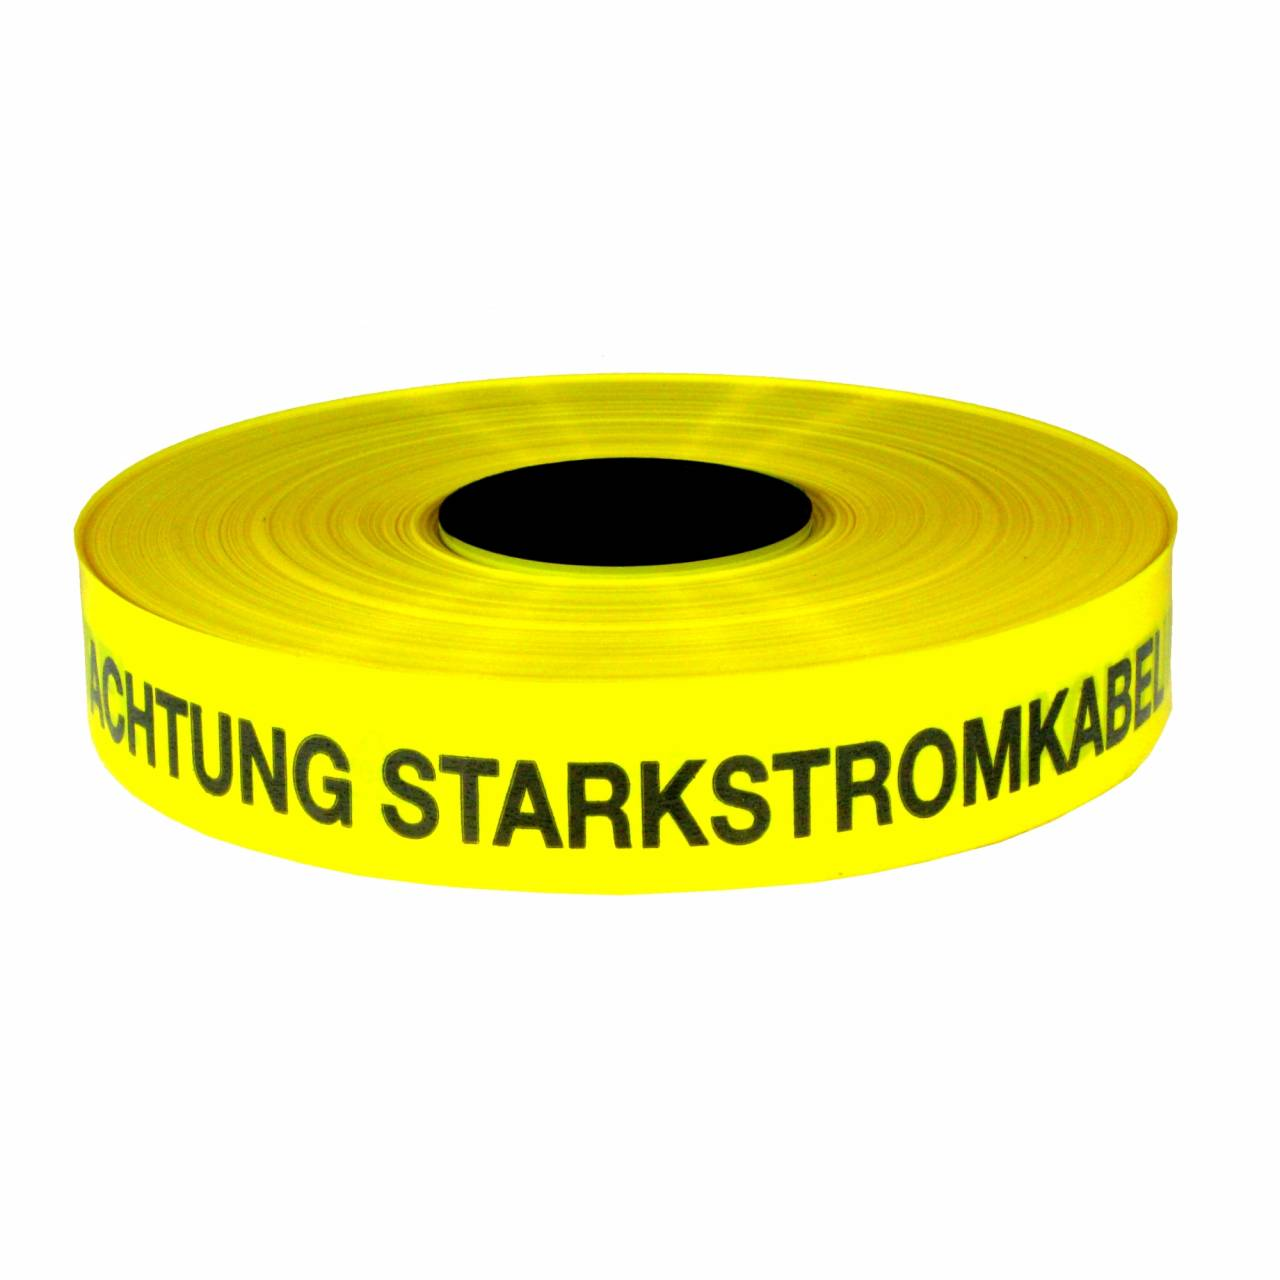 Trassenwarnband 'Achtung Starkstrom' / Rolle 40 mm x 250 m